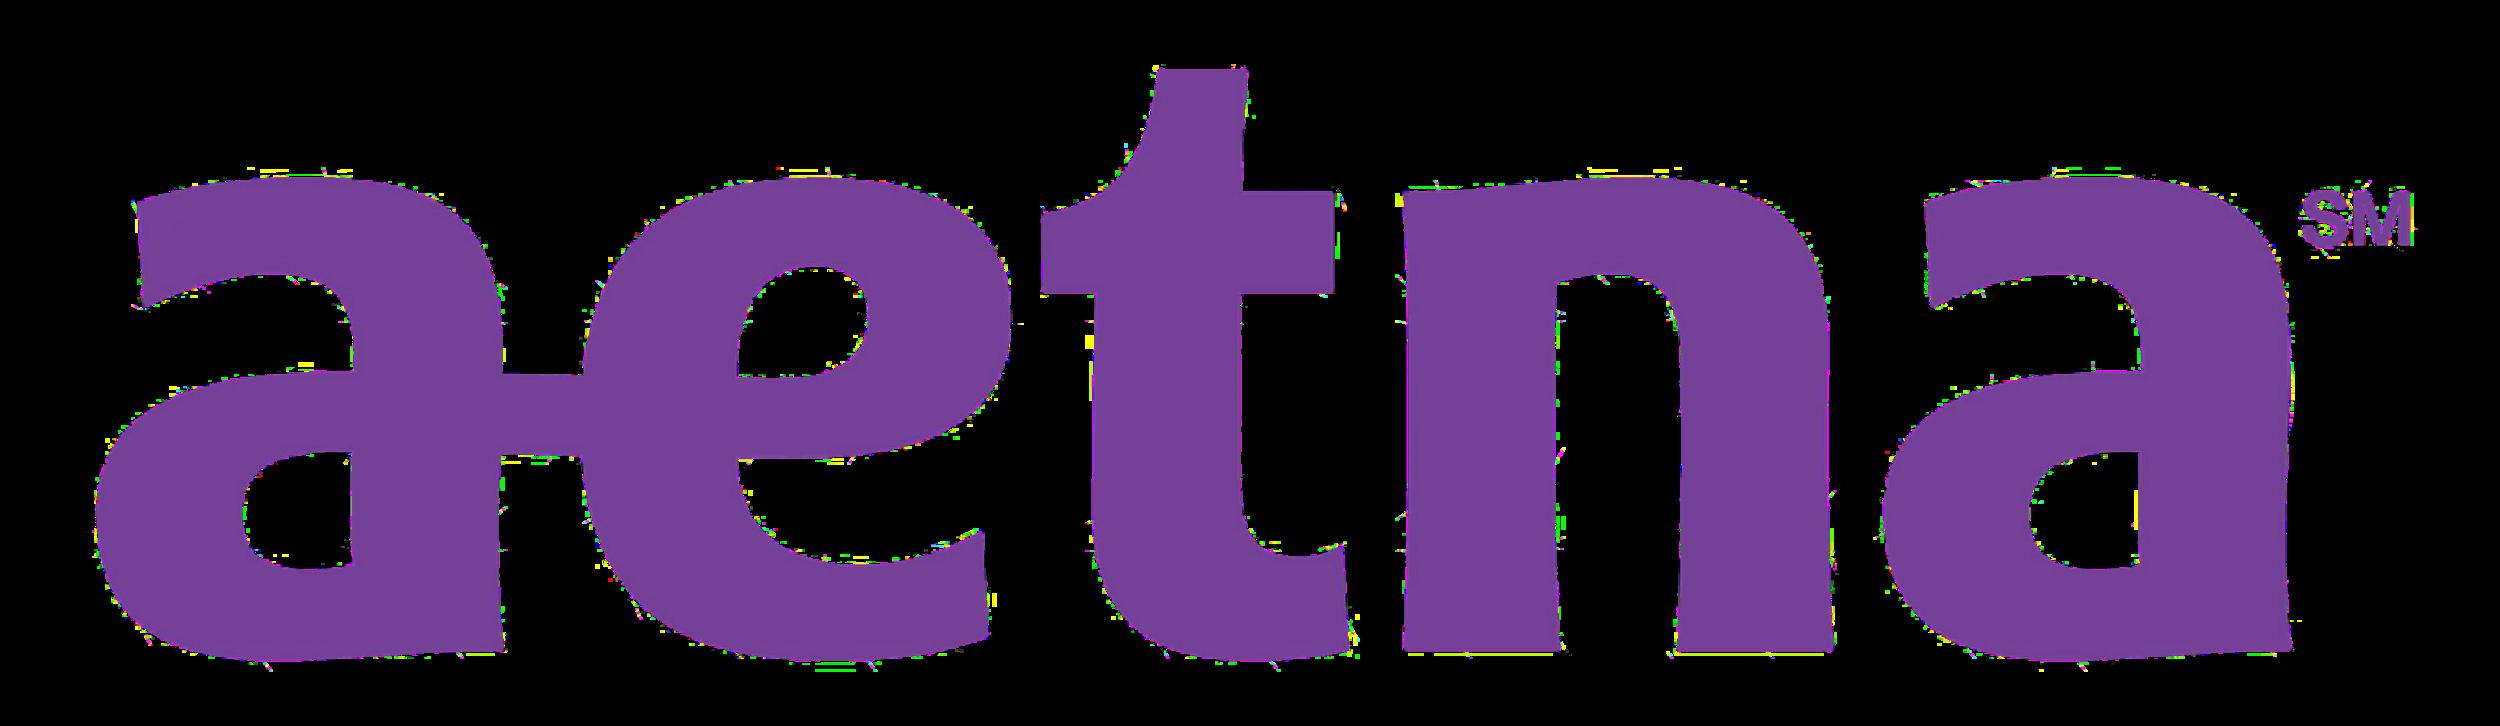 aetna-logo-transparent-2.png